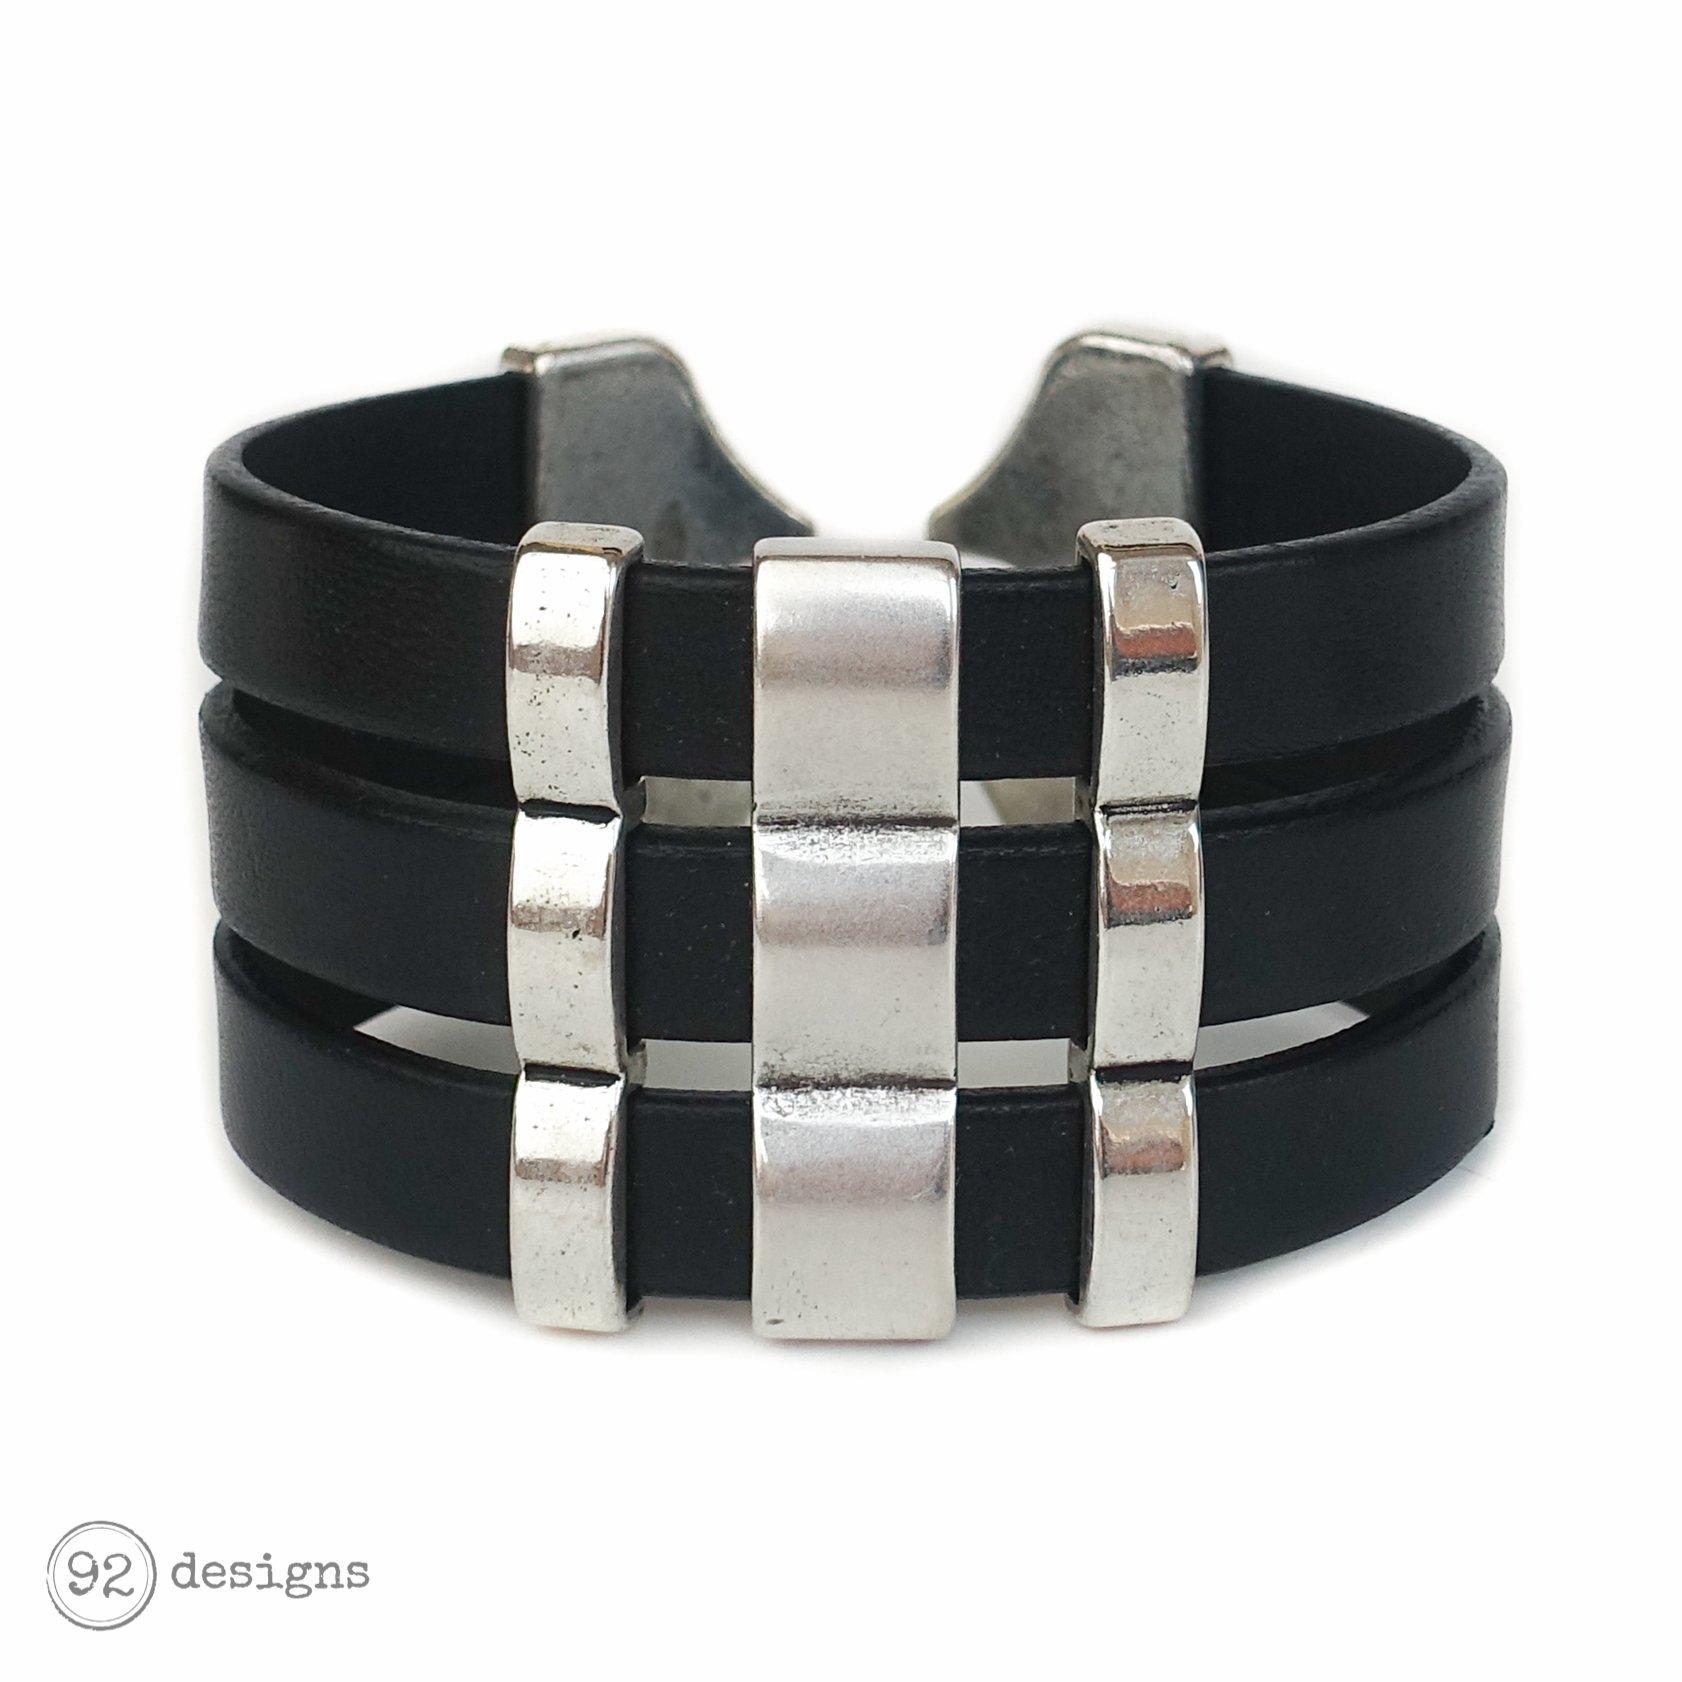 Triple Leather Cuff - black:silver